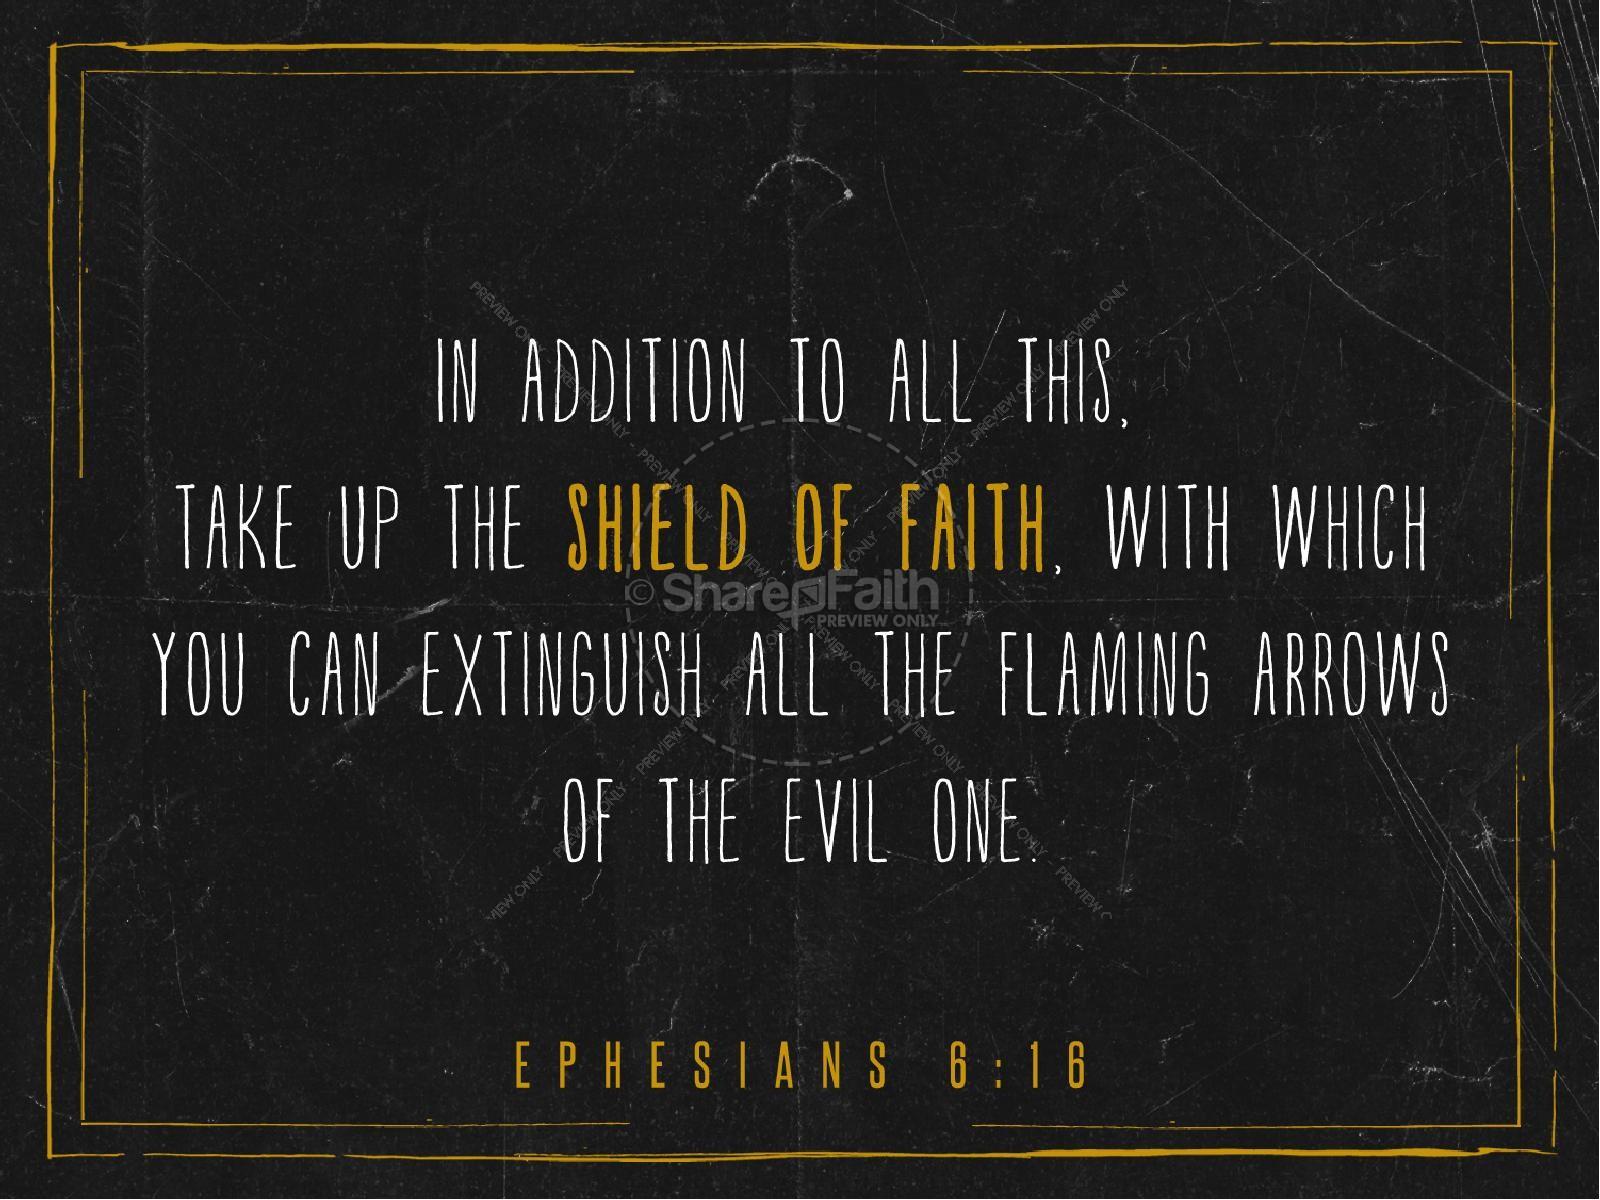 The Shield of Faith Sermon PowerPoint For Church | slide 4